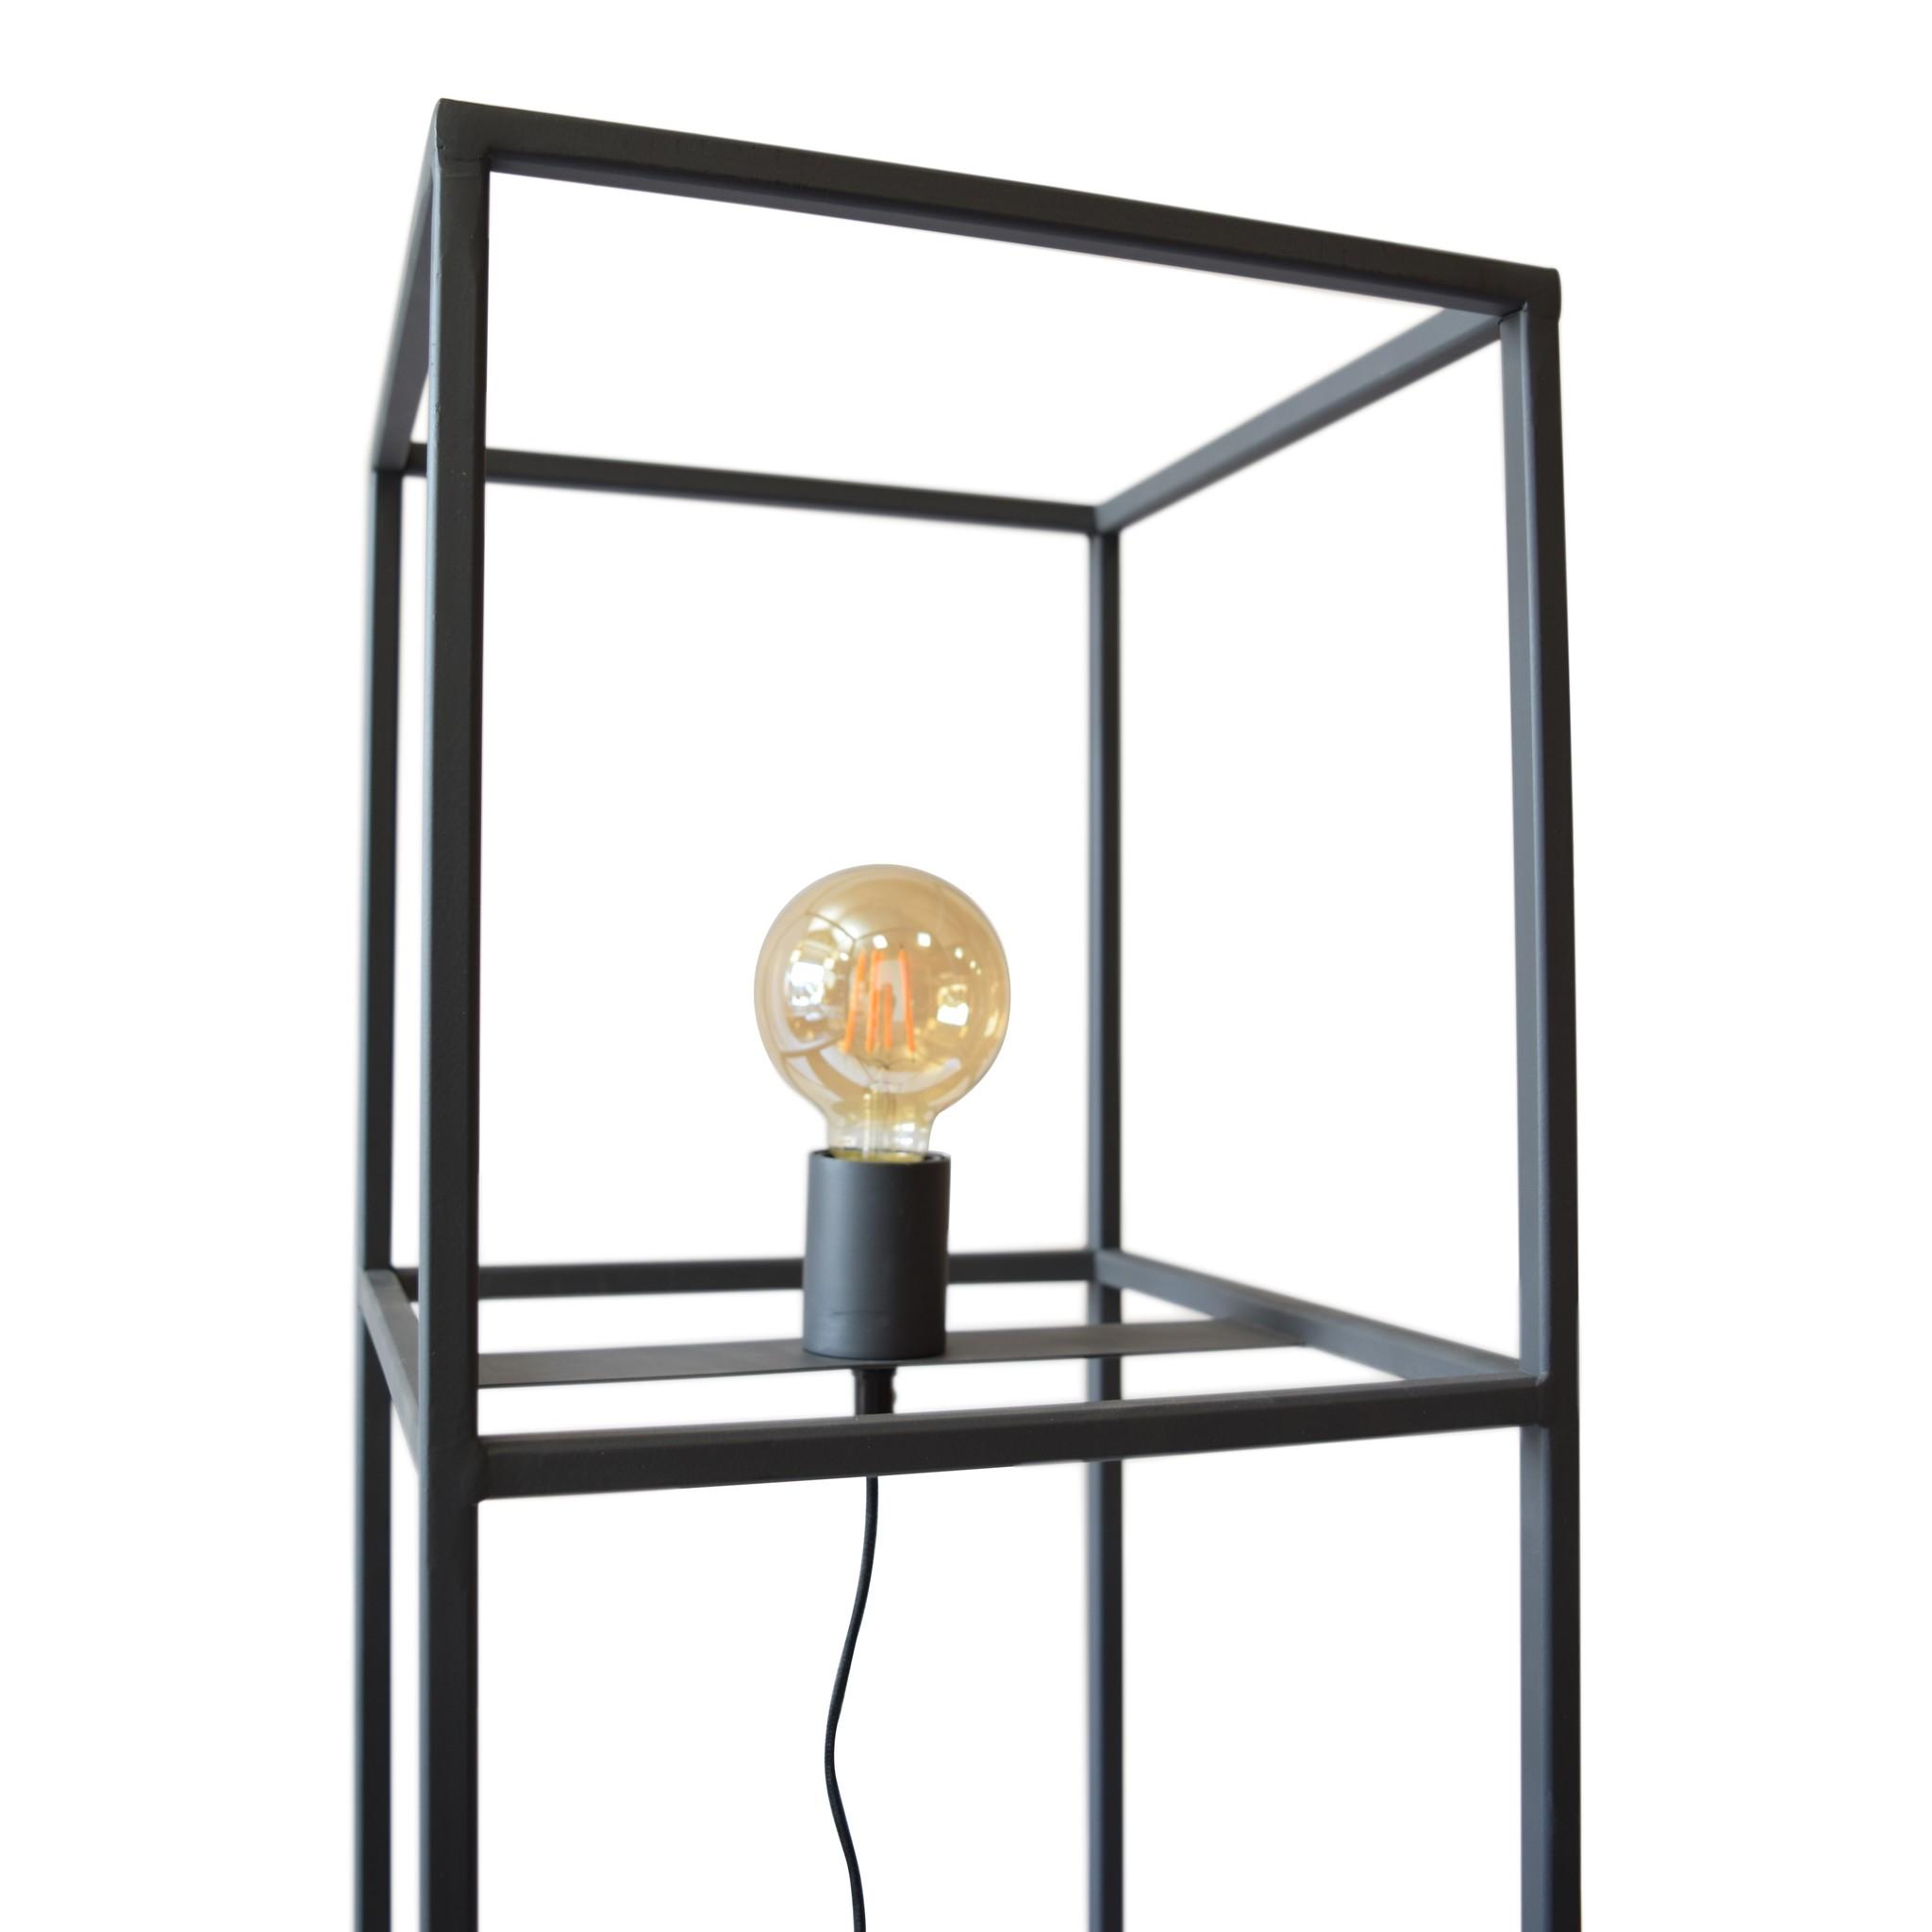 Urban Interiors Urban Interiors Vloerlamp Frame 30x30x120 Zwart